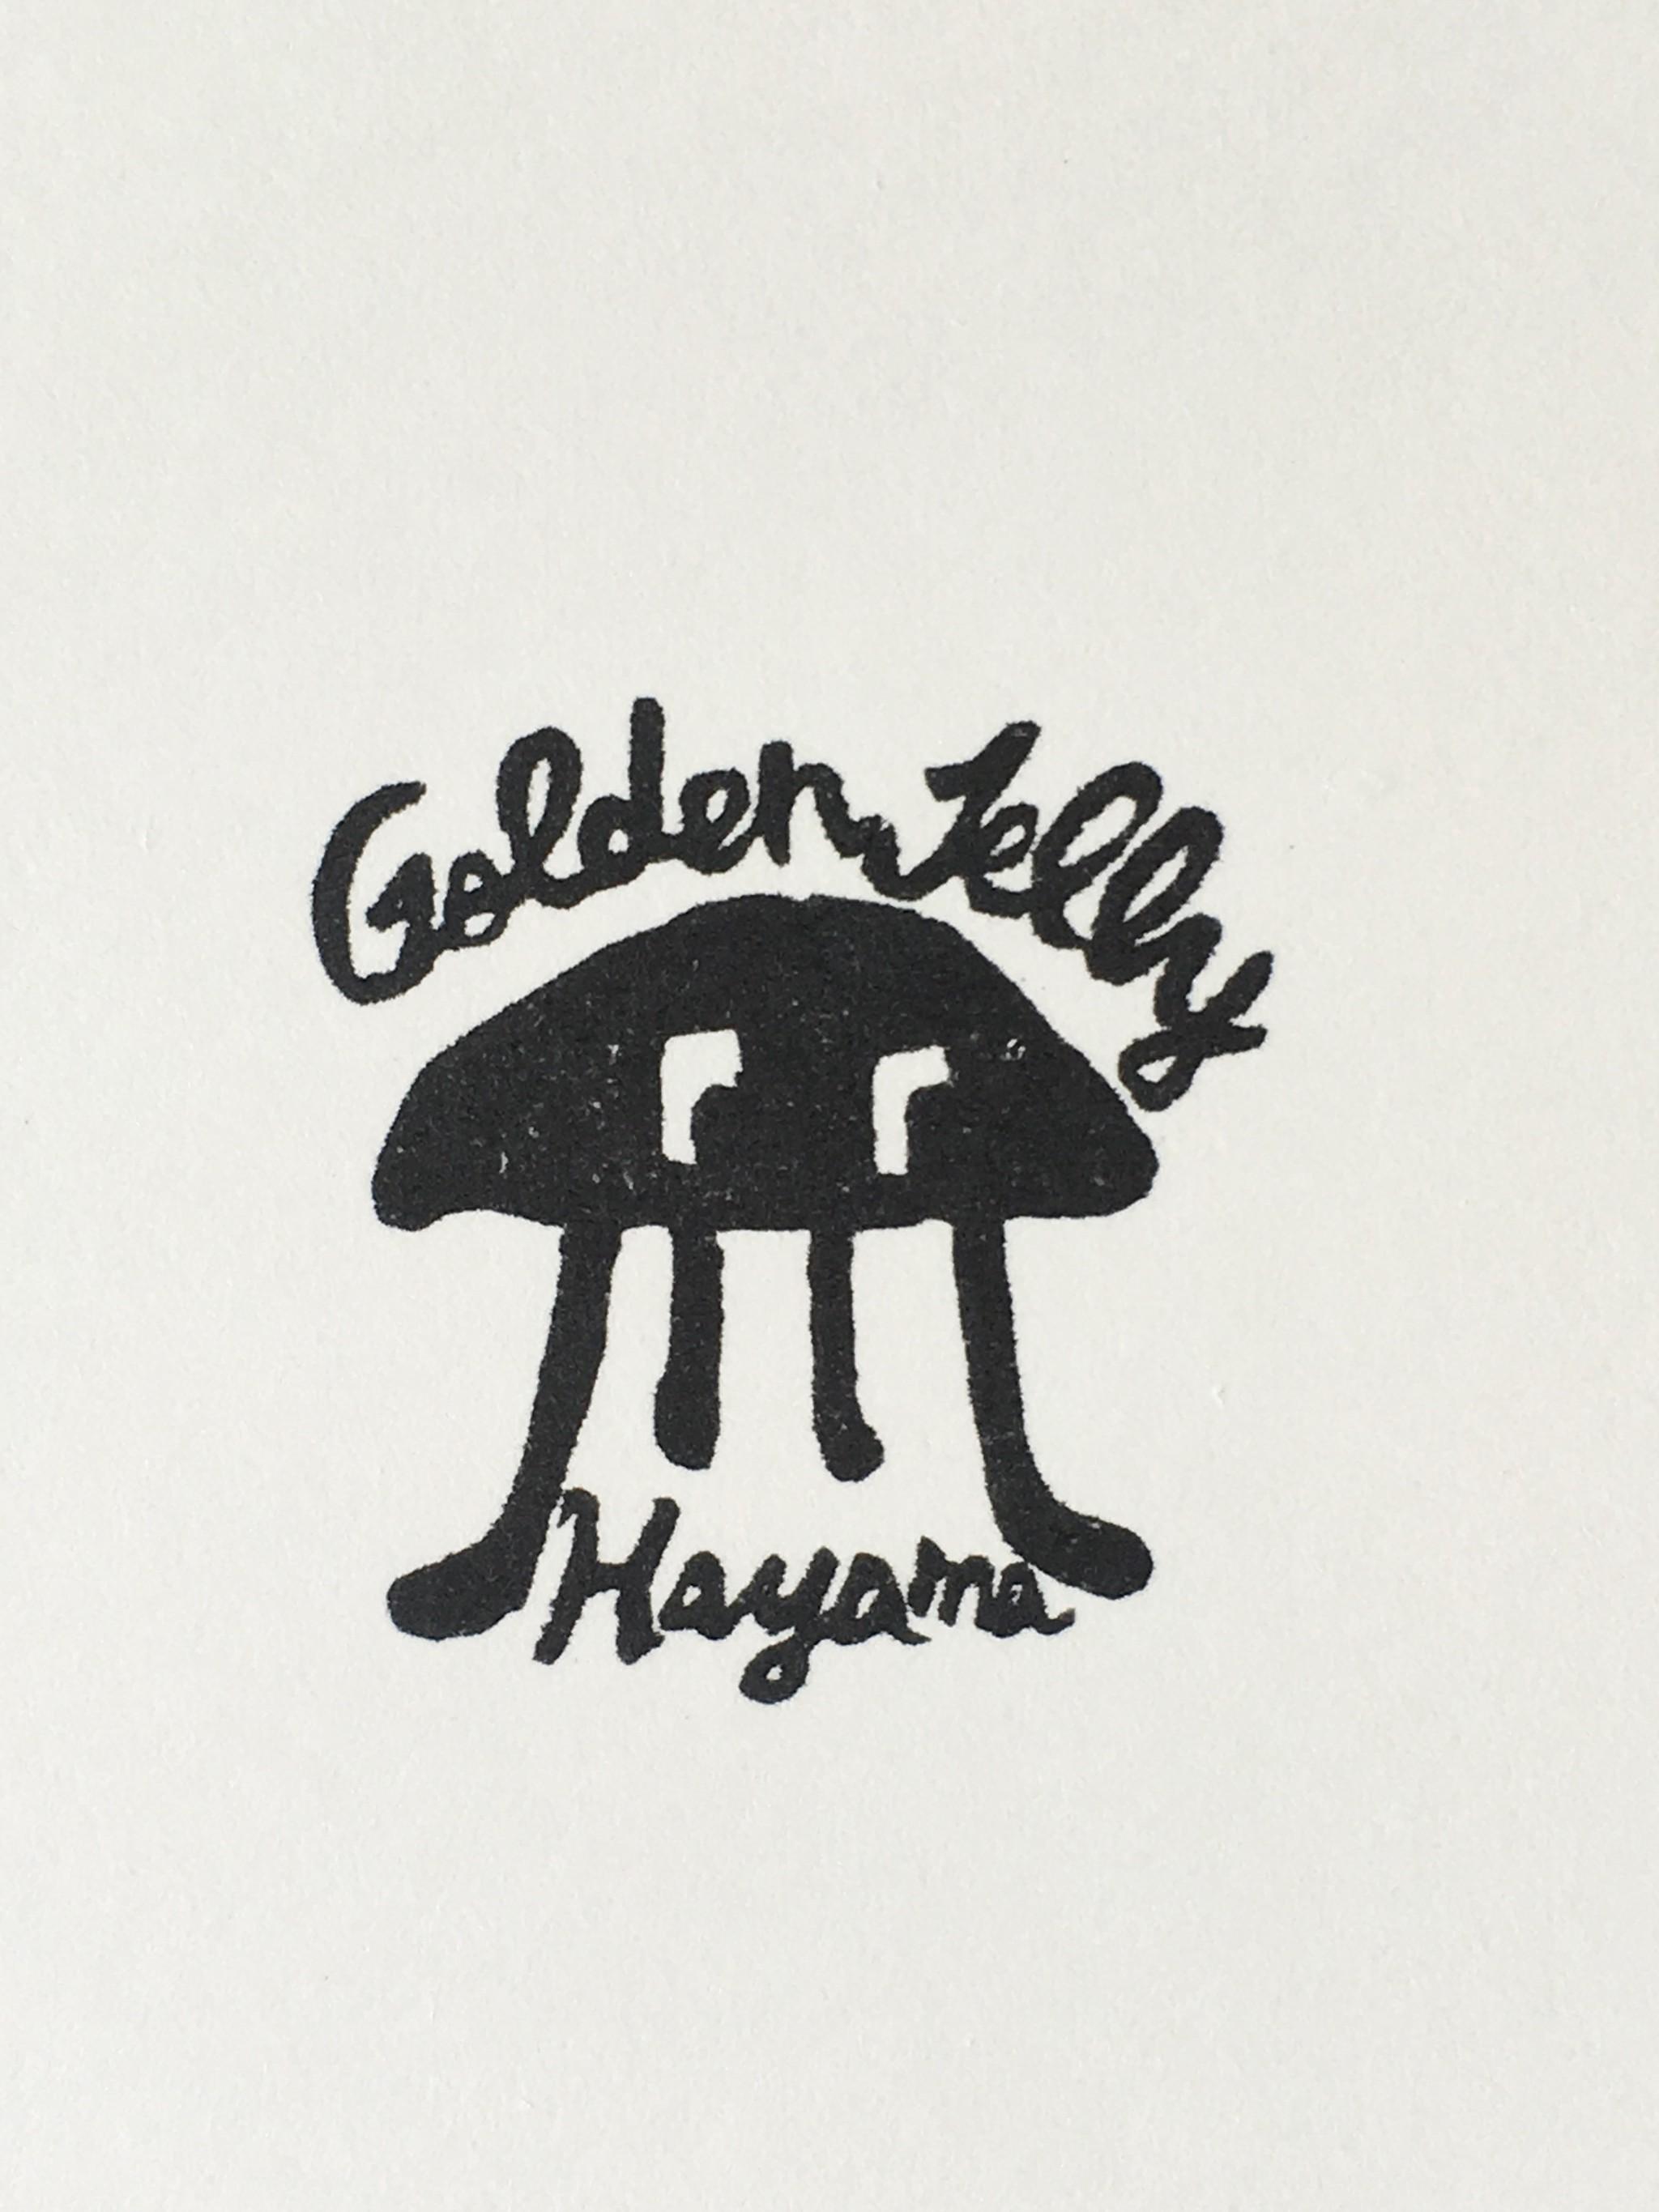 goldenjelly